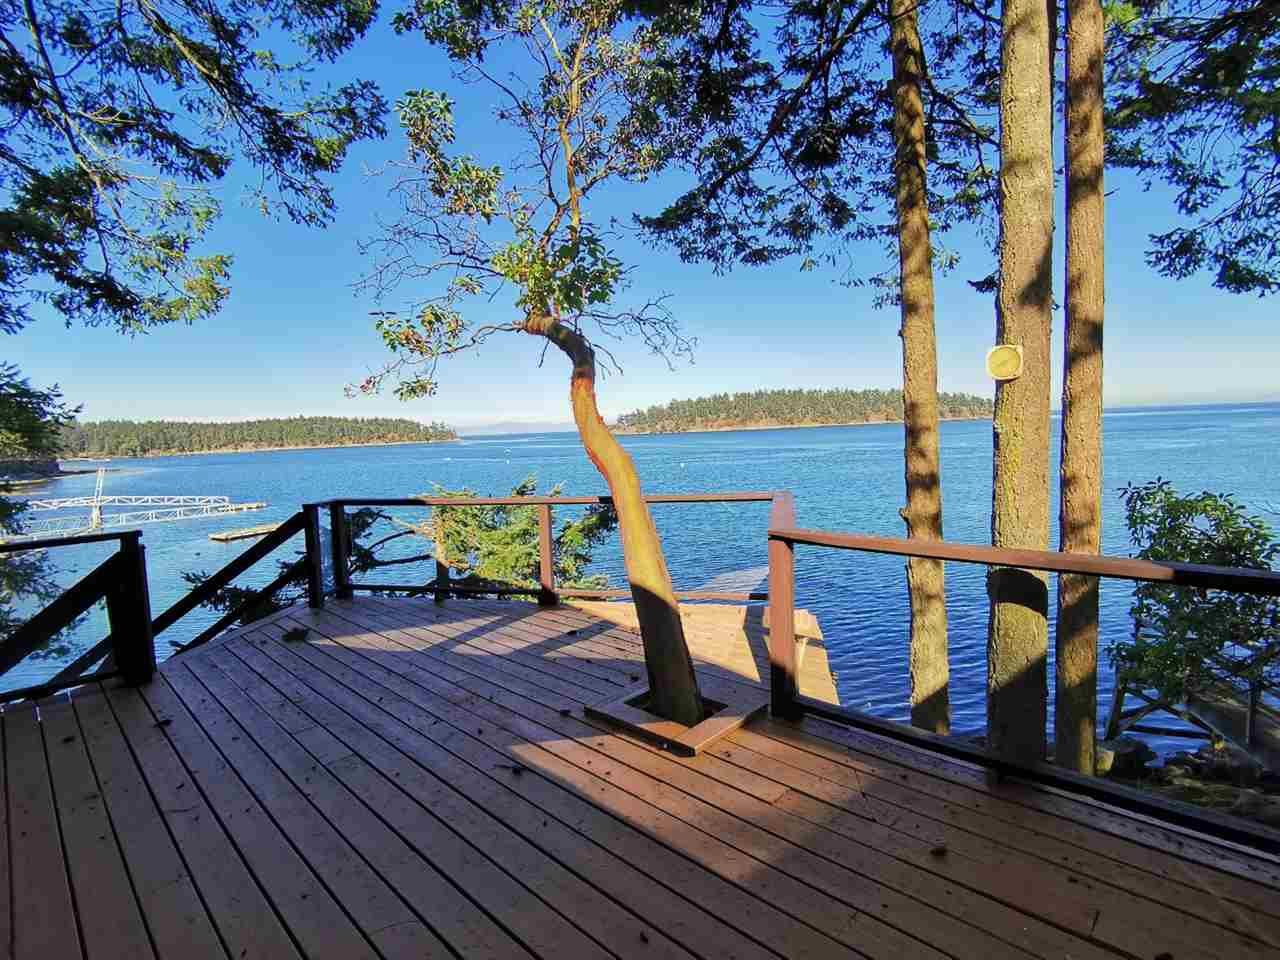 Main Photo: 578 ARBUTUS Drive: Mayne Island House for sale (Islands-Van. & Gulf)  : MLS®# R2504459